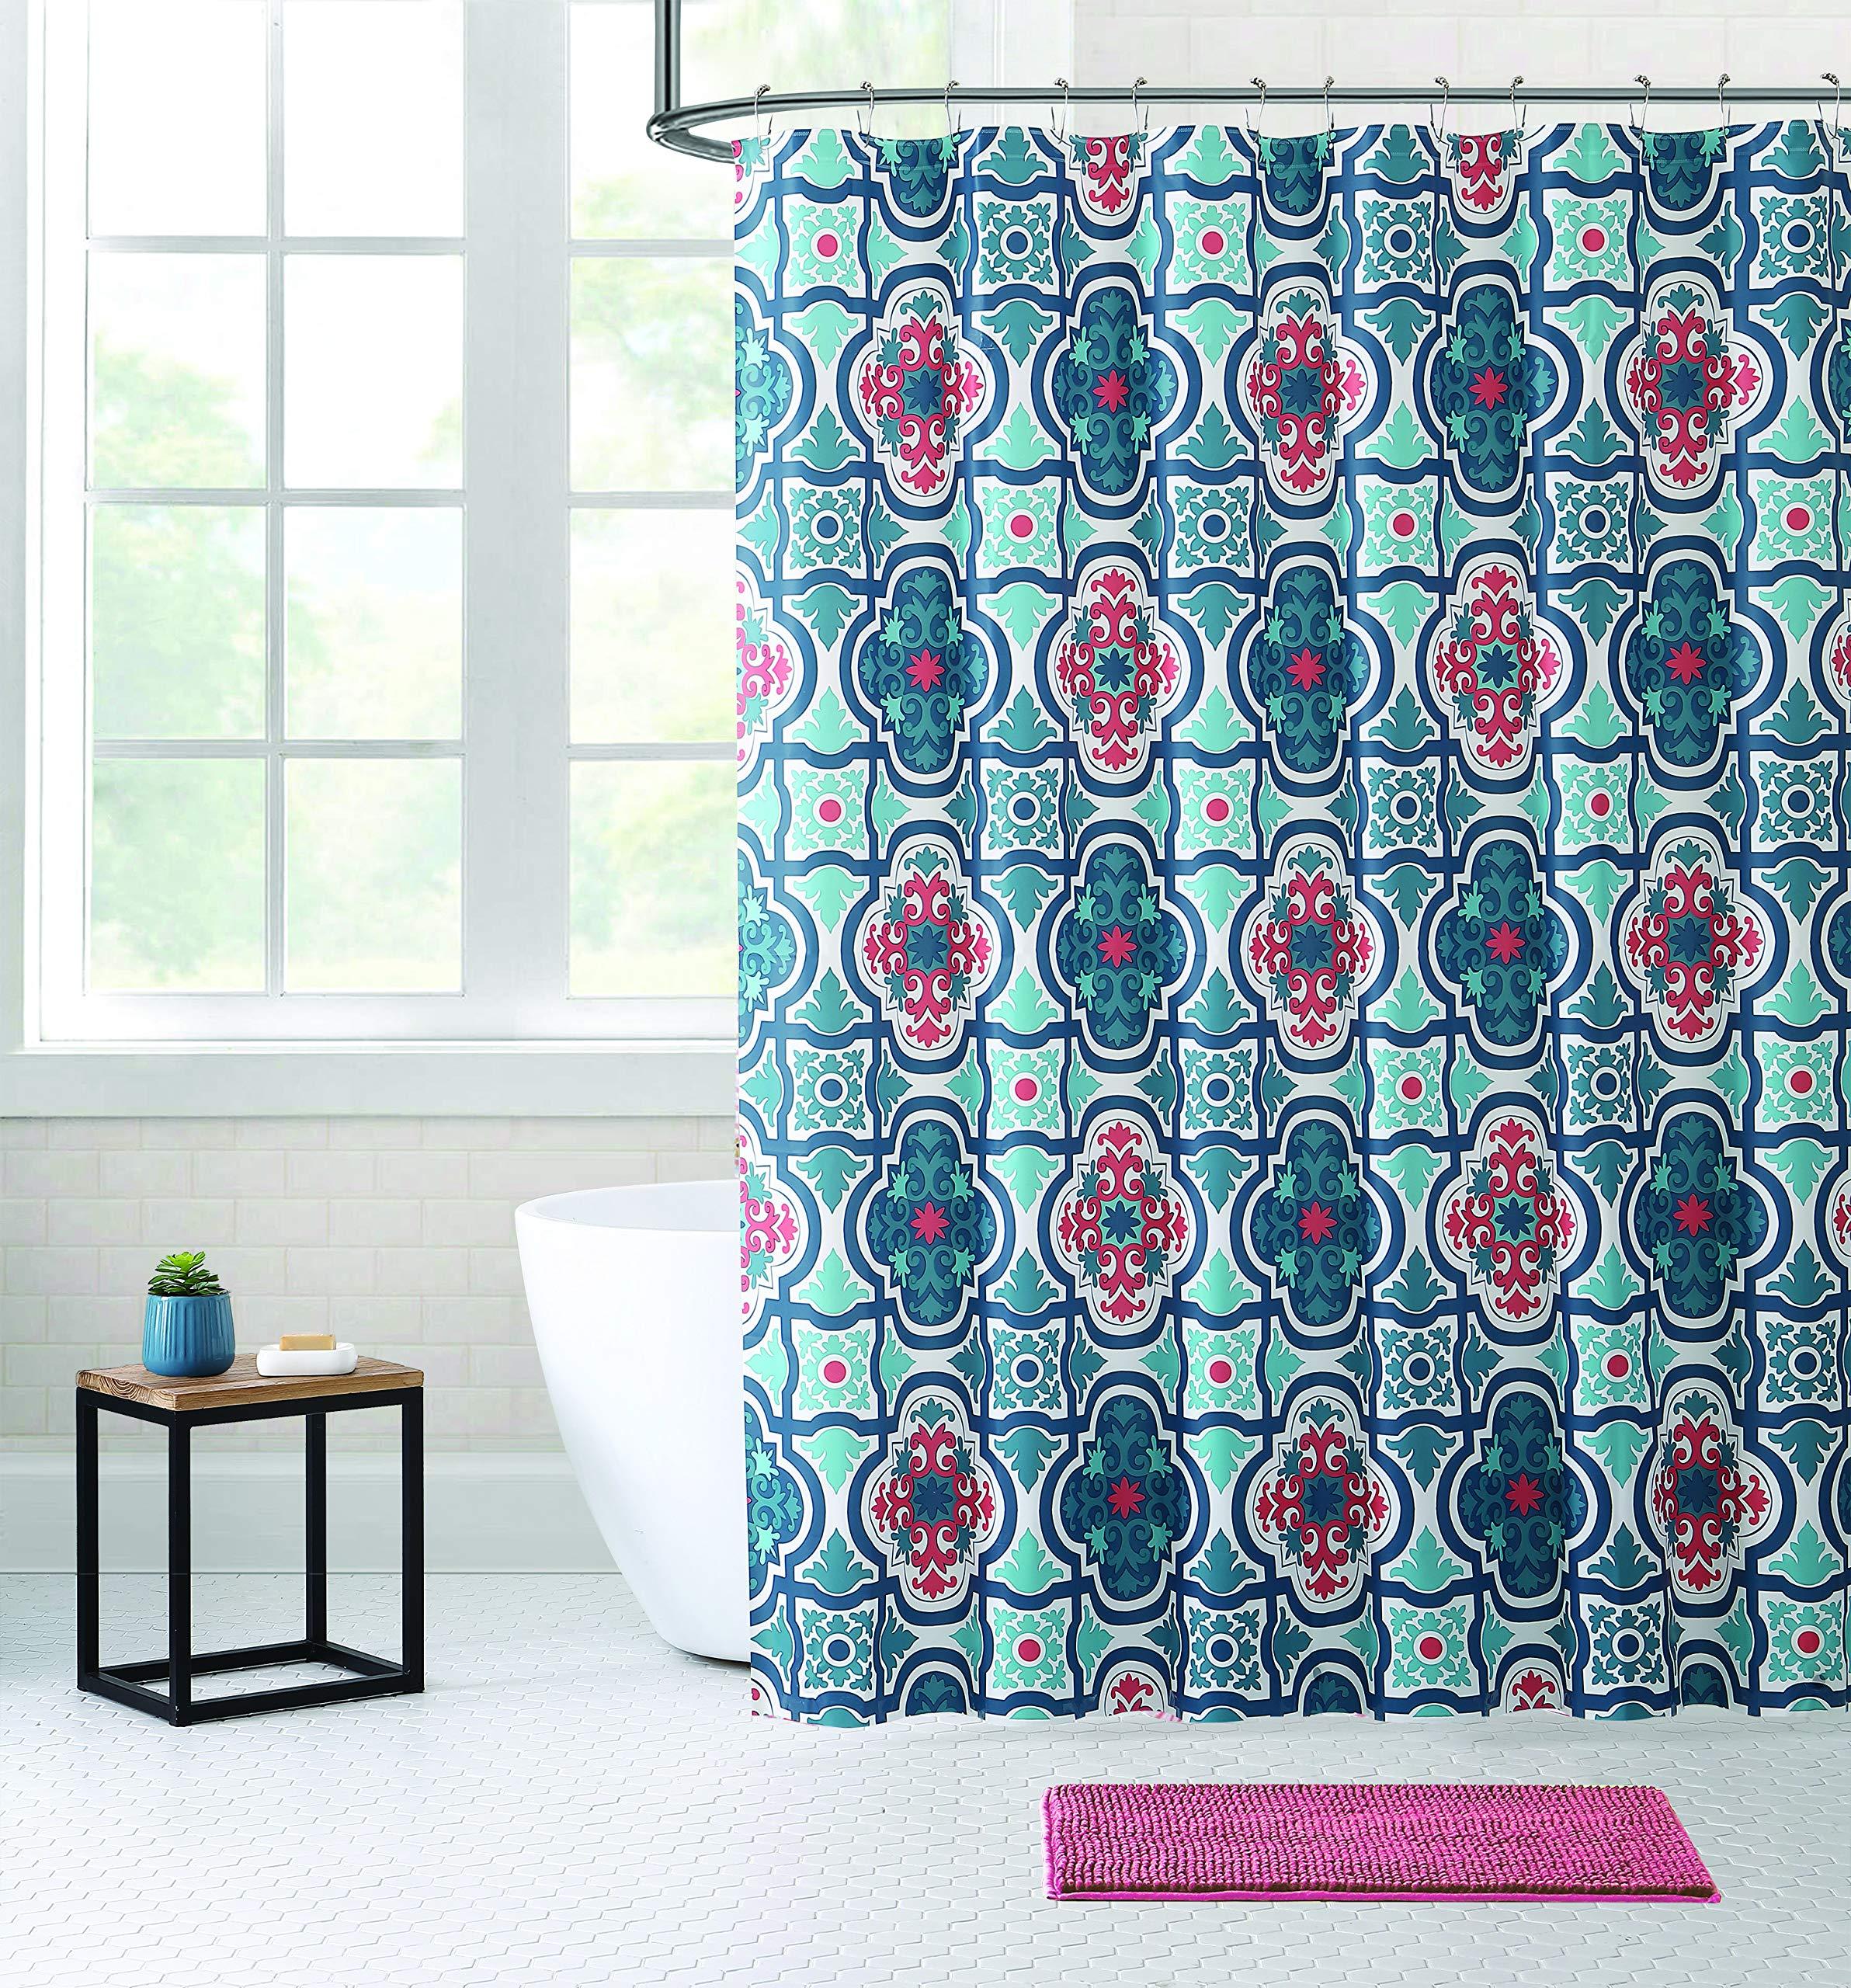 Bibb Home 14 Piece Shower Curtain & Anti-Slip Noodle Chenille Bath Rug Mat Set with 12 Metal Roller Hooks - Mildew Resistant Waterproof Water-Repellent & Antibacterial (Red Moroccan)